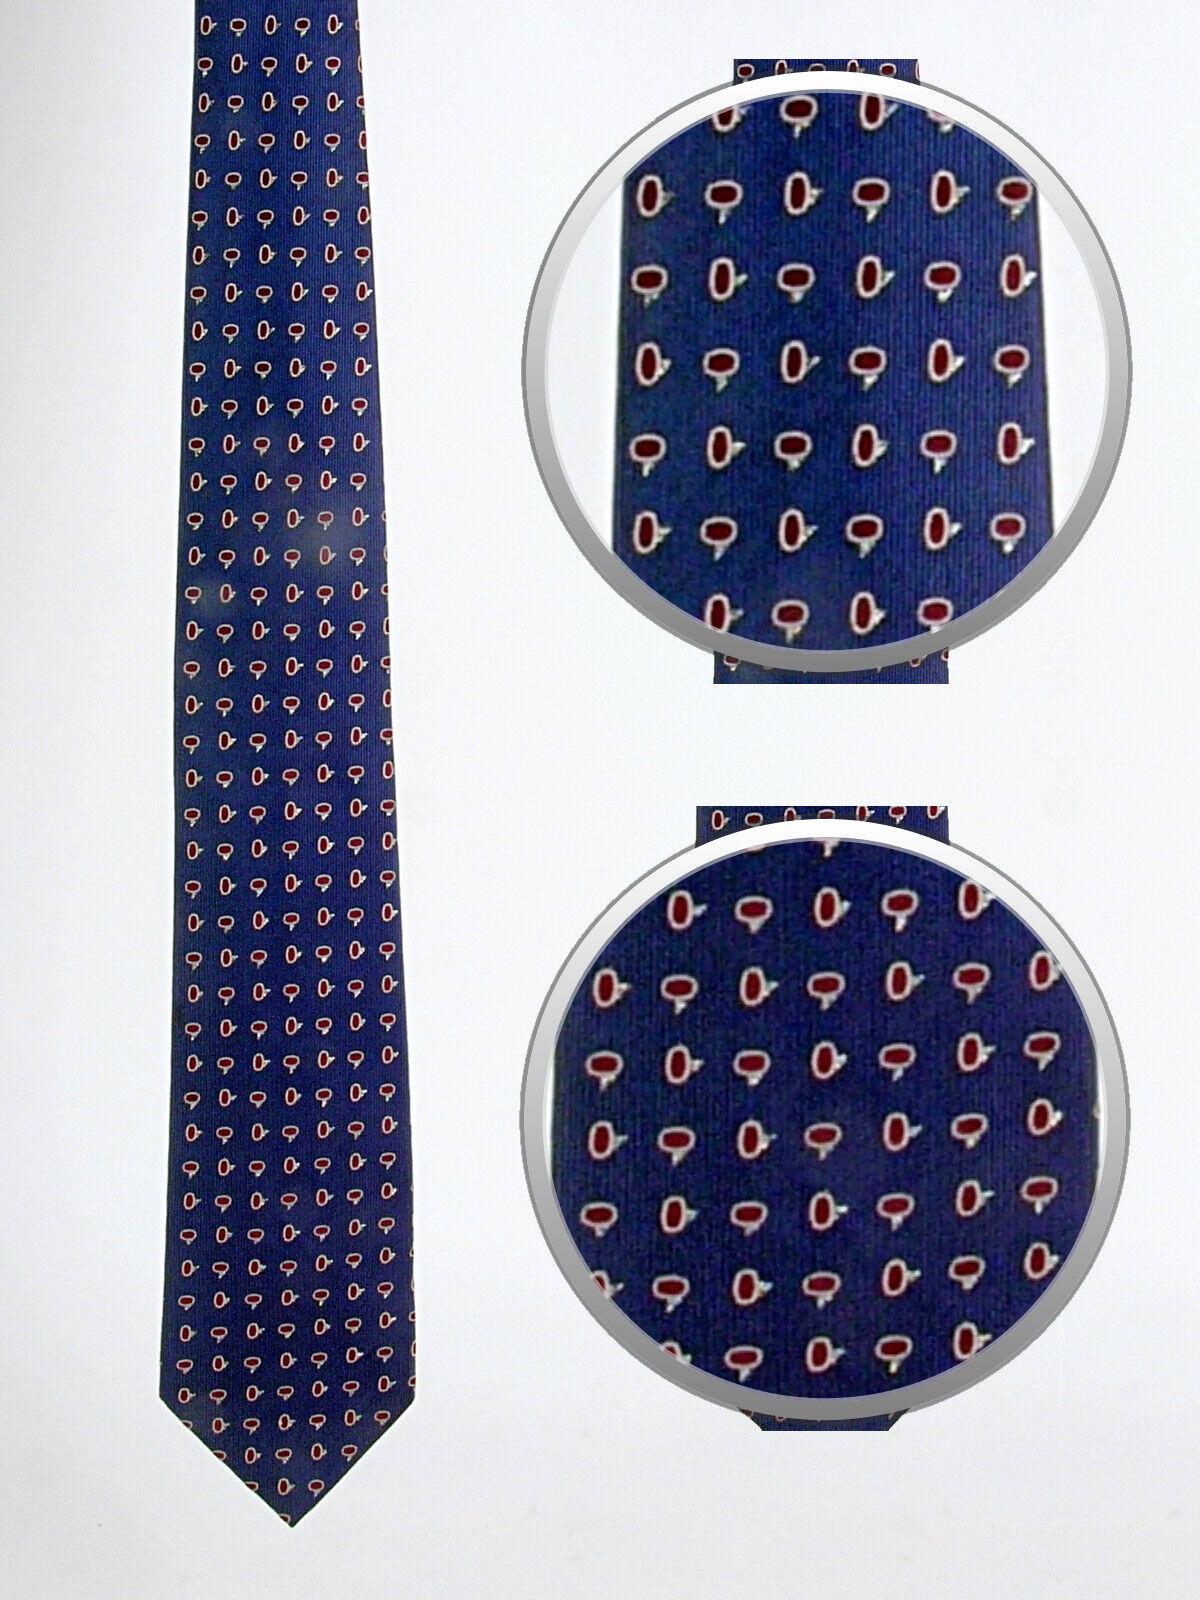 Festliche Krawatte blau, violett, gemustert · Seide · Neu